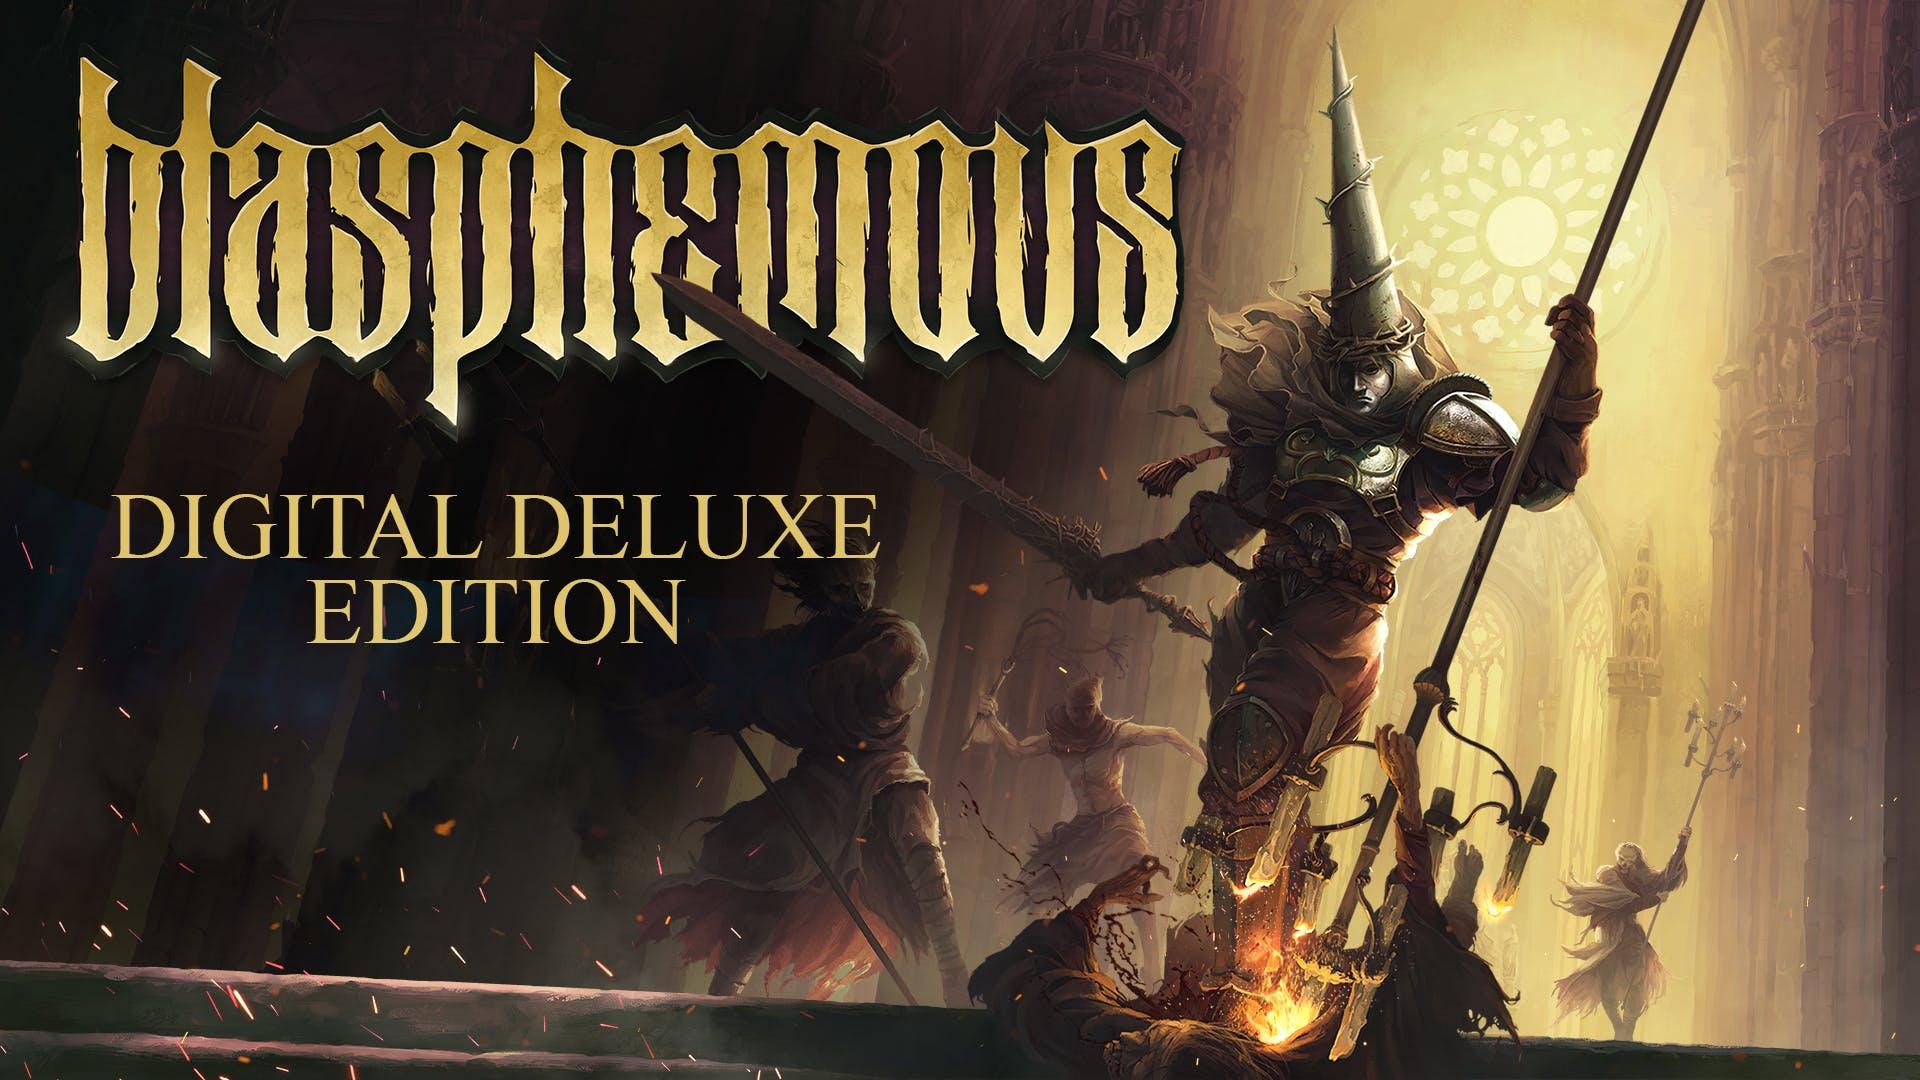 Blasphemous - Digital Deluxe Edition